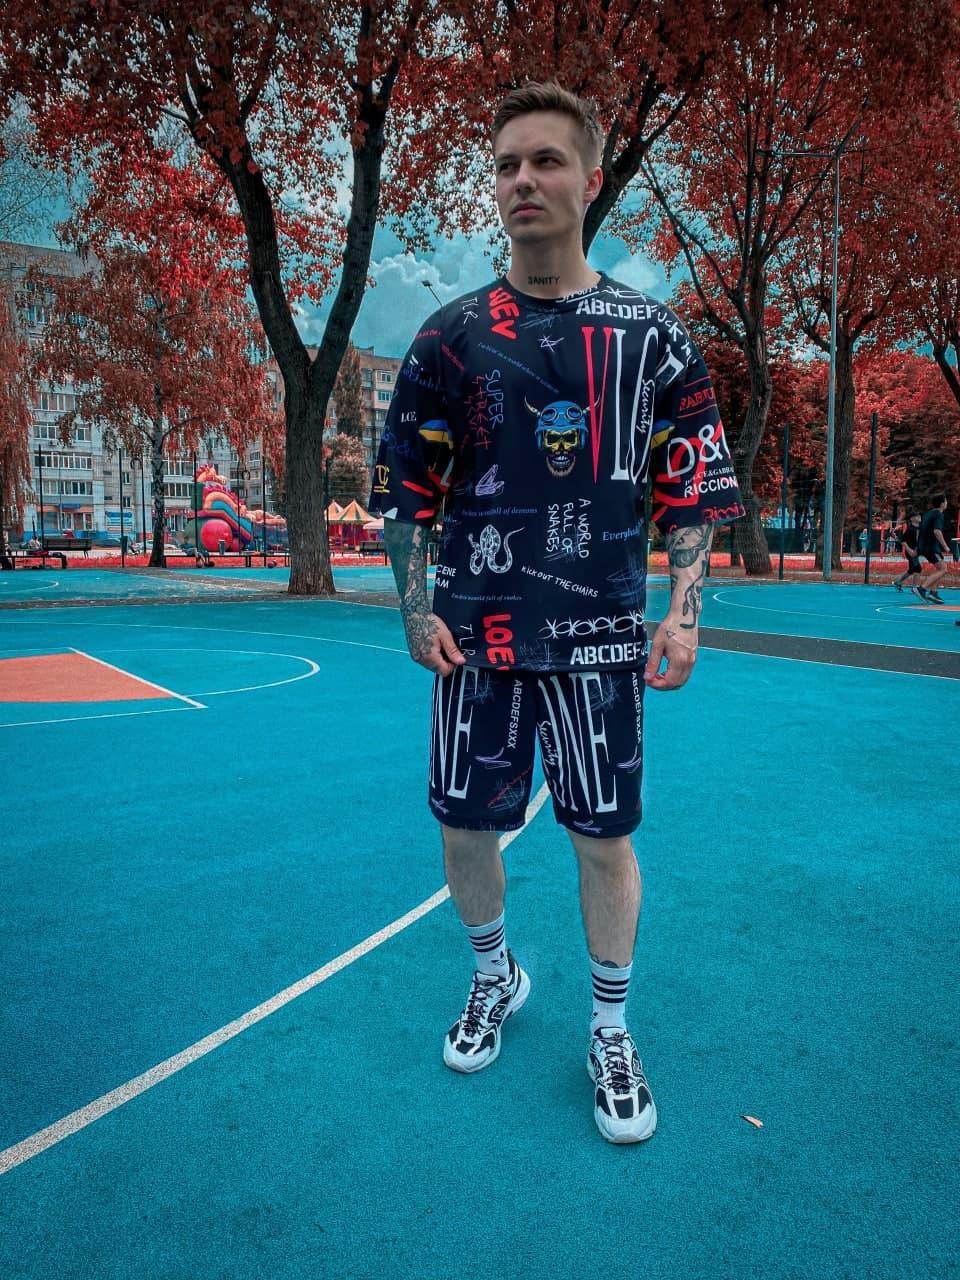 Спортивний костюм Чоловічий спортивний комплект / чоловічий комплект шорти+футболки чорний з малюнками